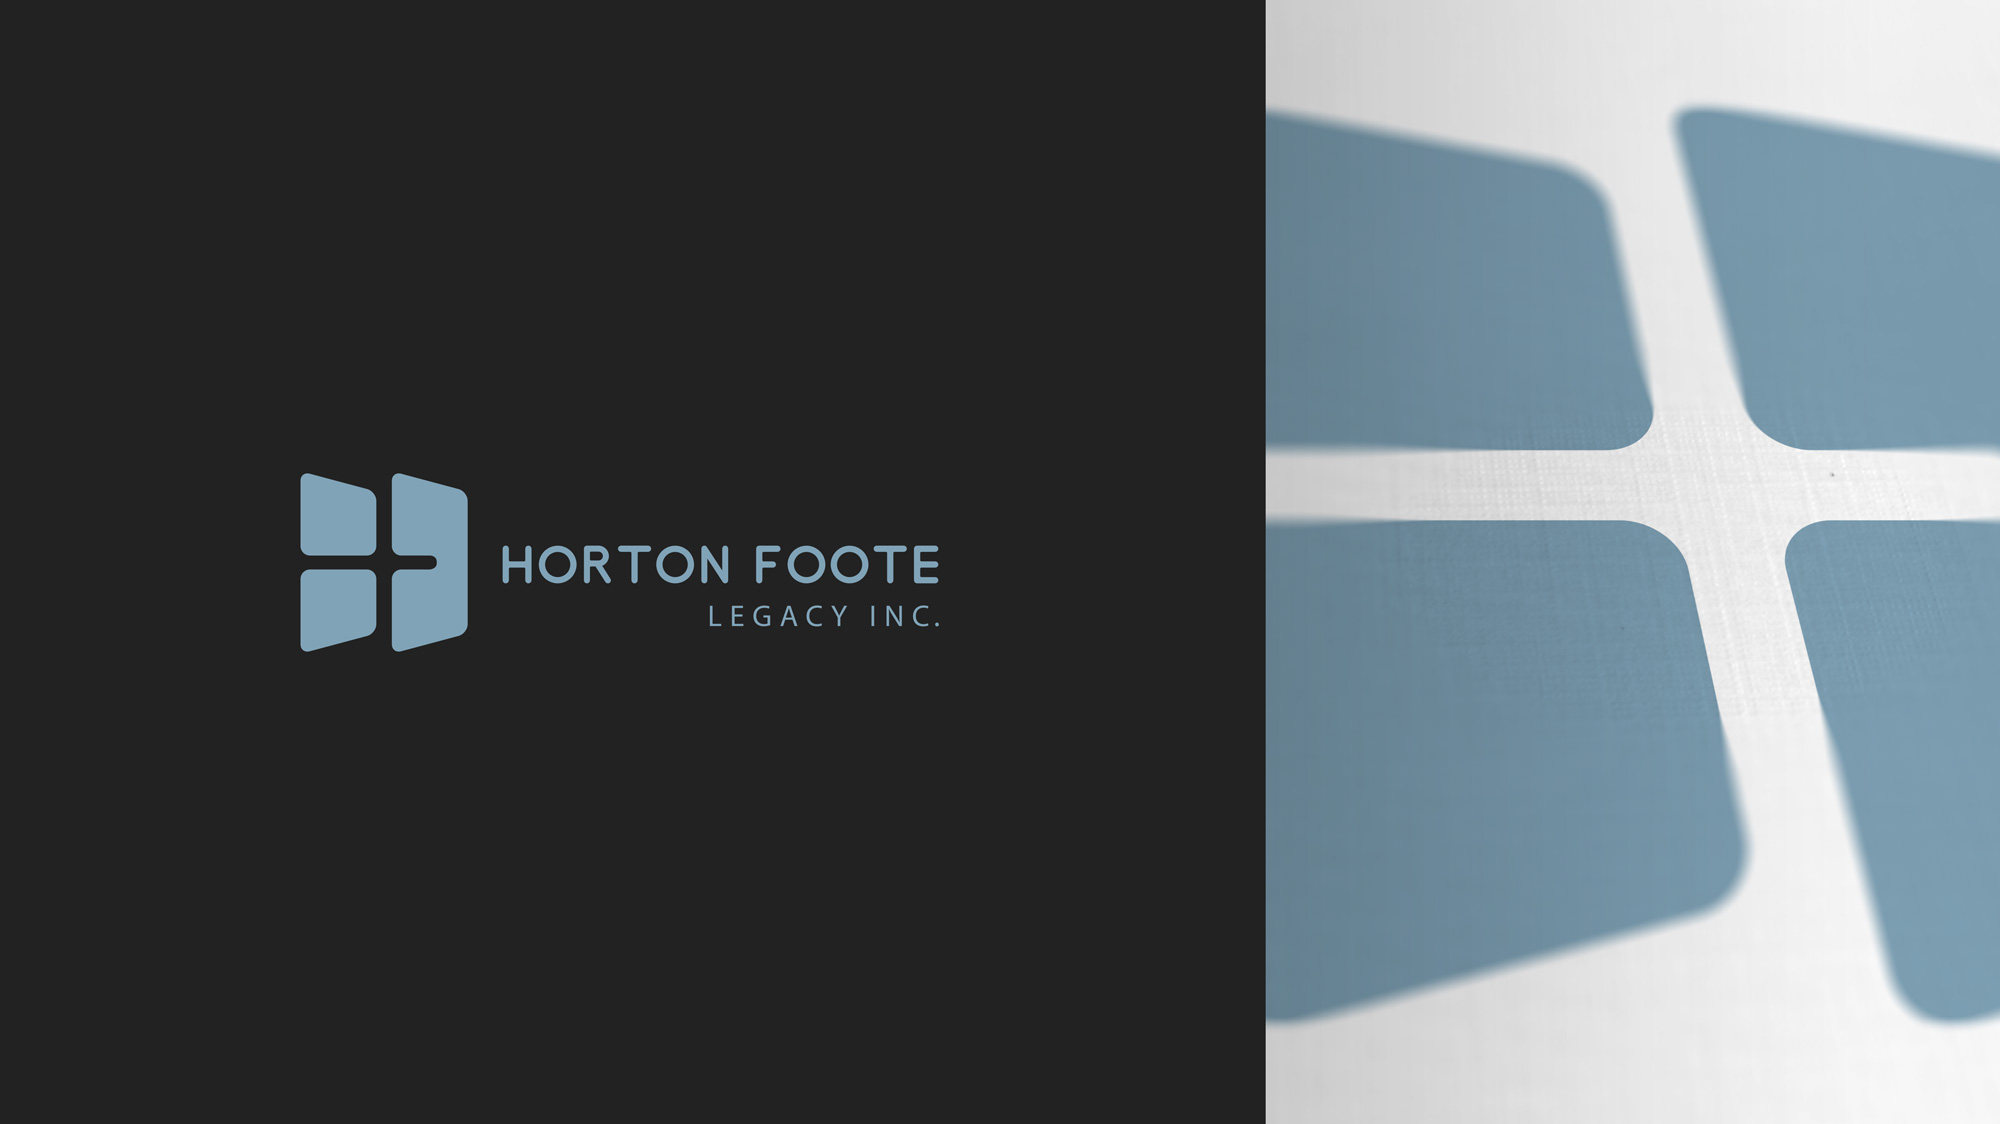 Horton Foote Legacy logo